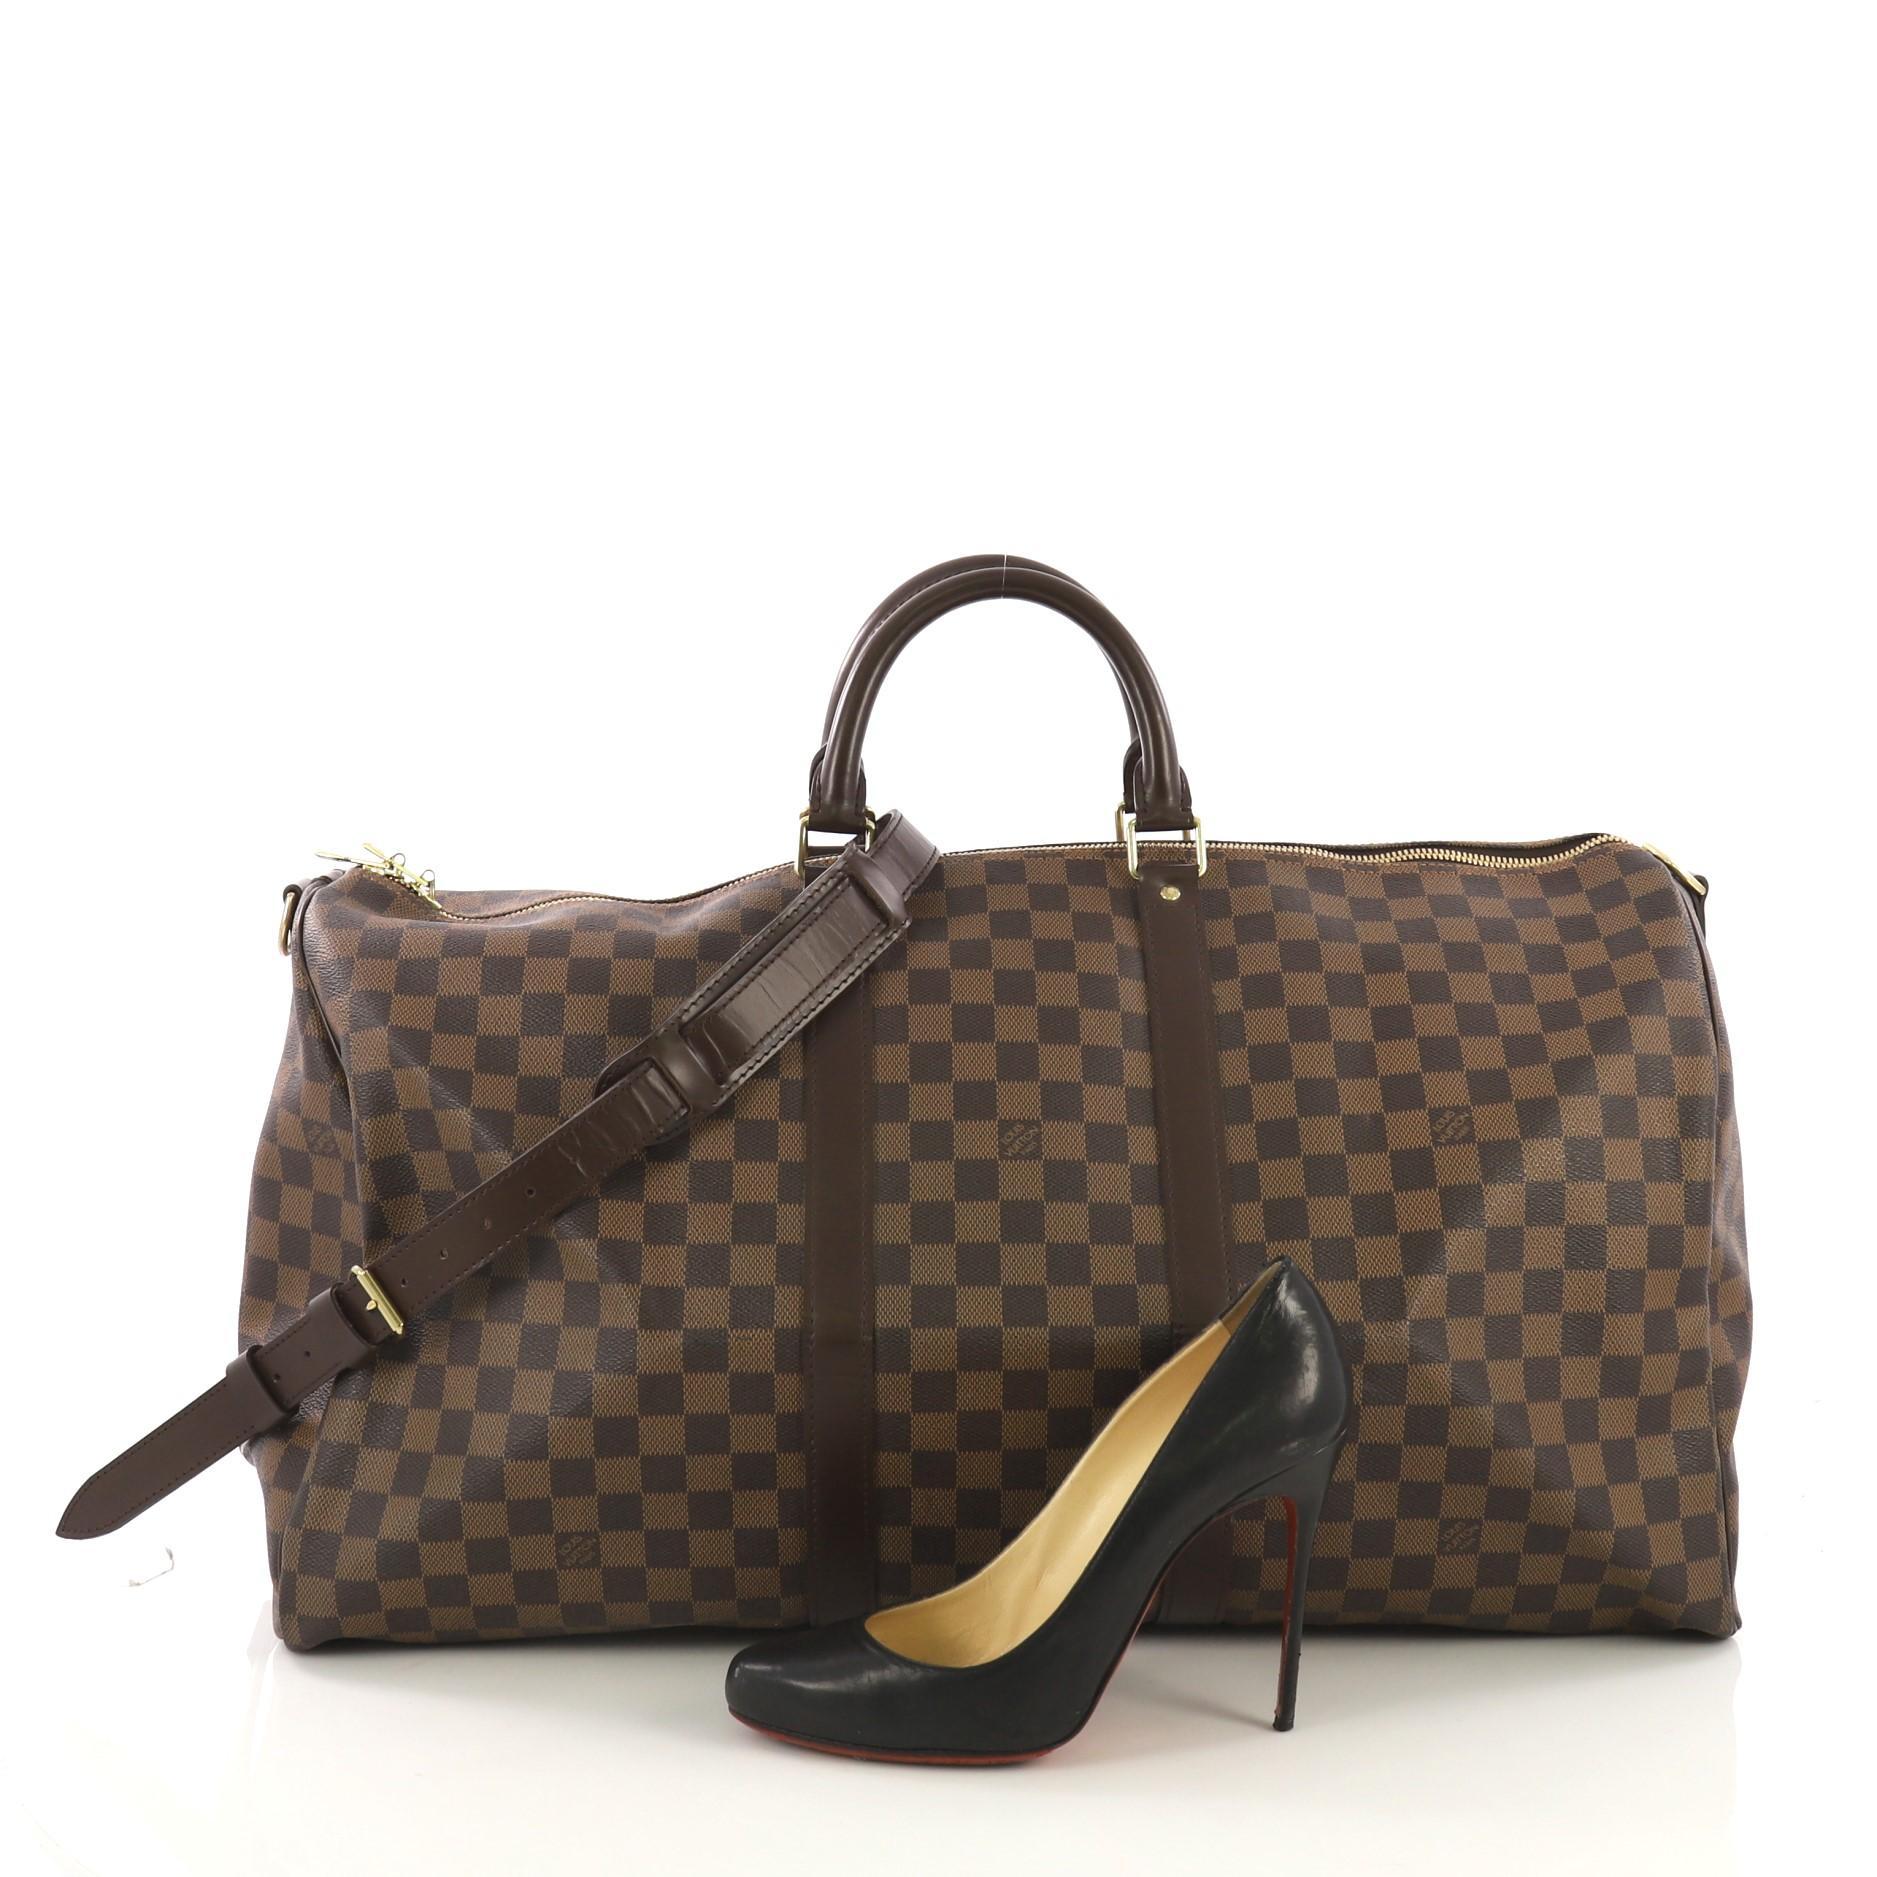 52e1d672e3 Louis Vuitton Keepall Bandouliere Bag Damier 55